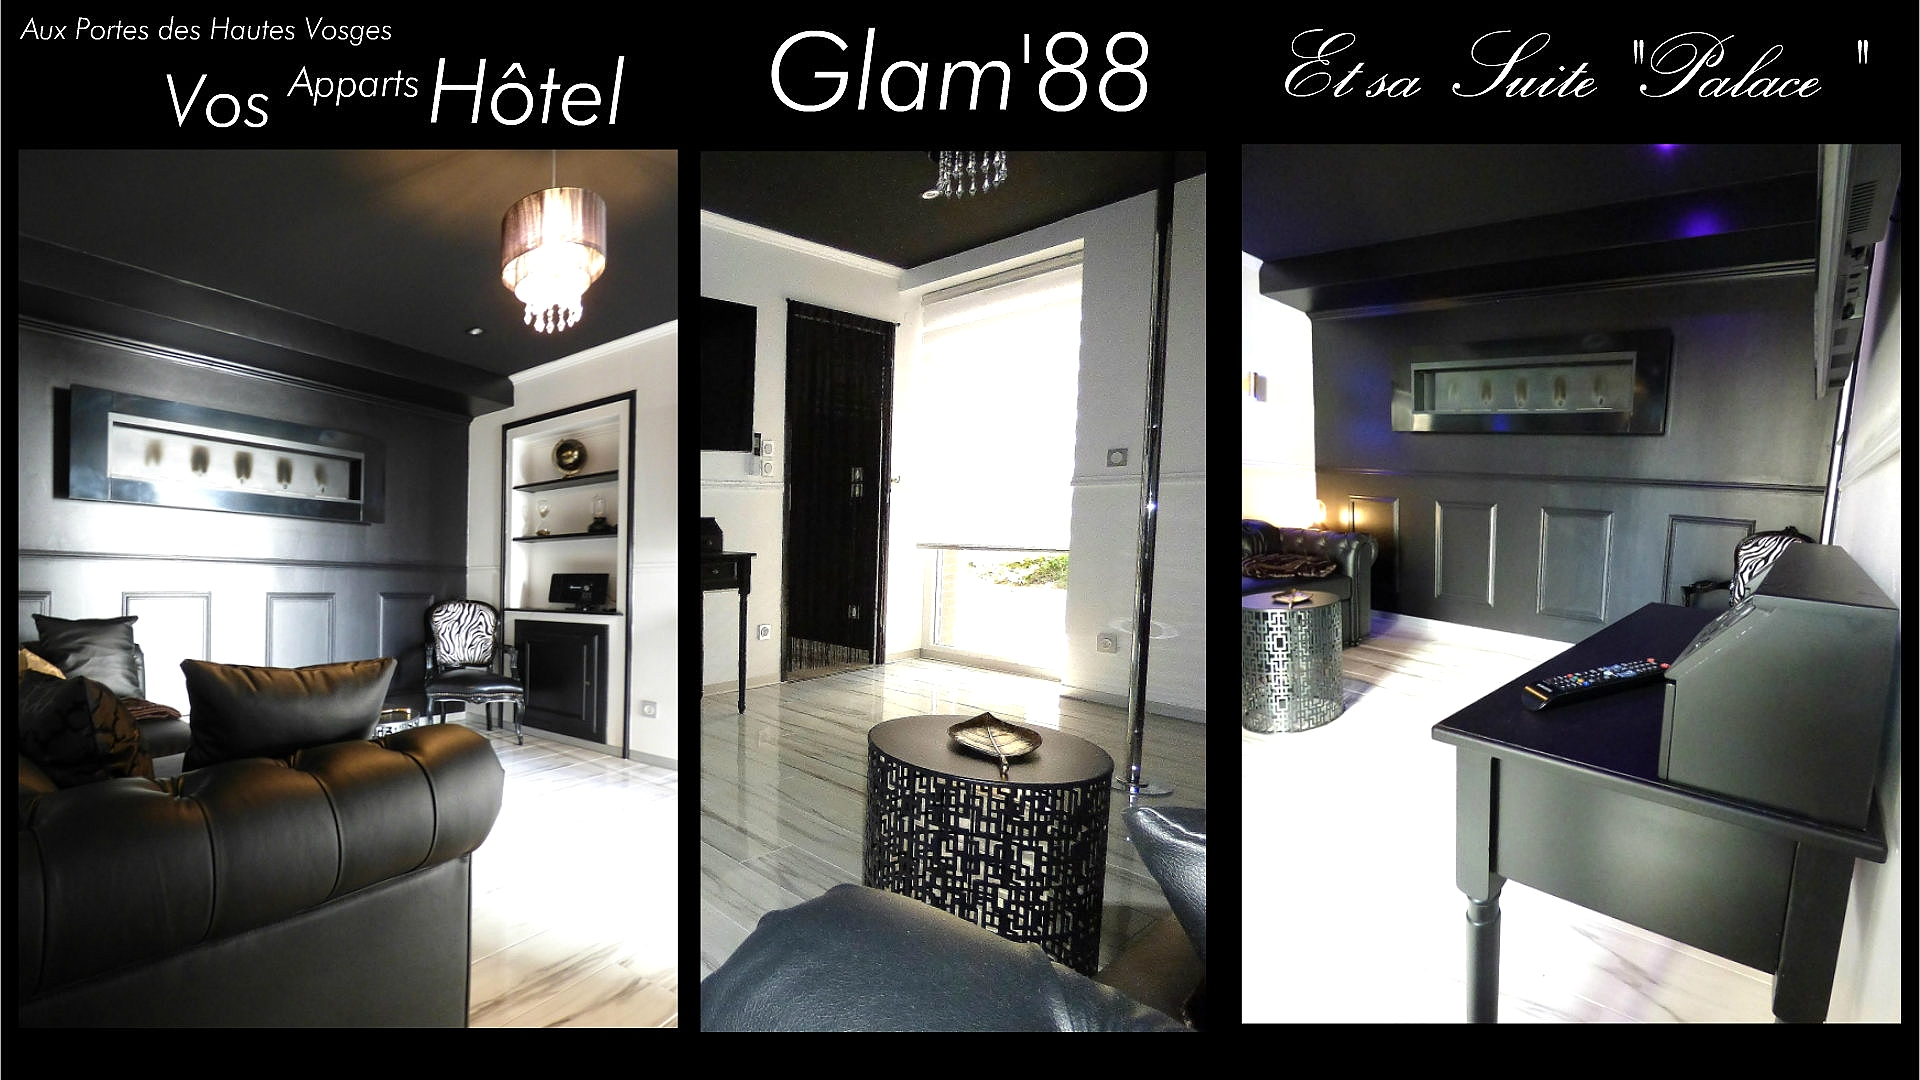 Nuit Gite Spa Sauna Appart Hotel Spa Glam88